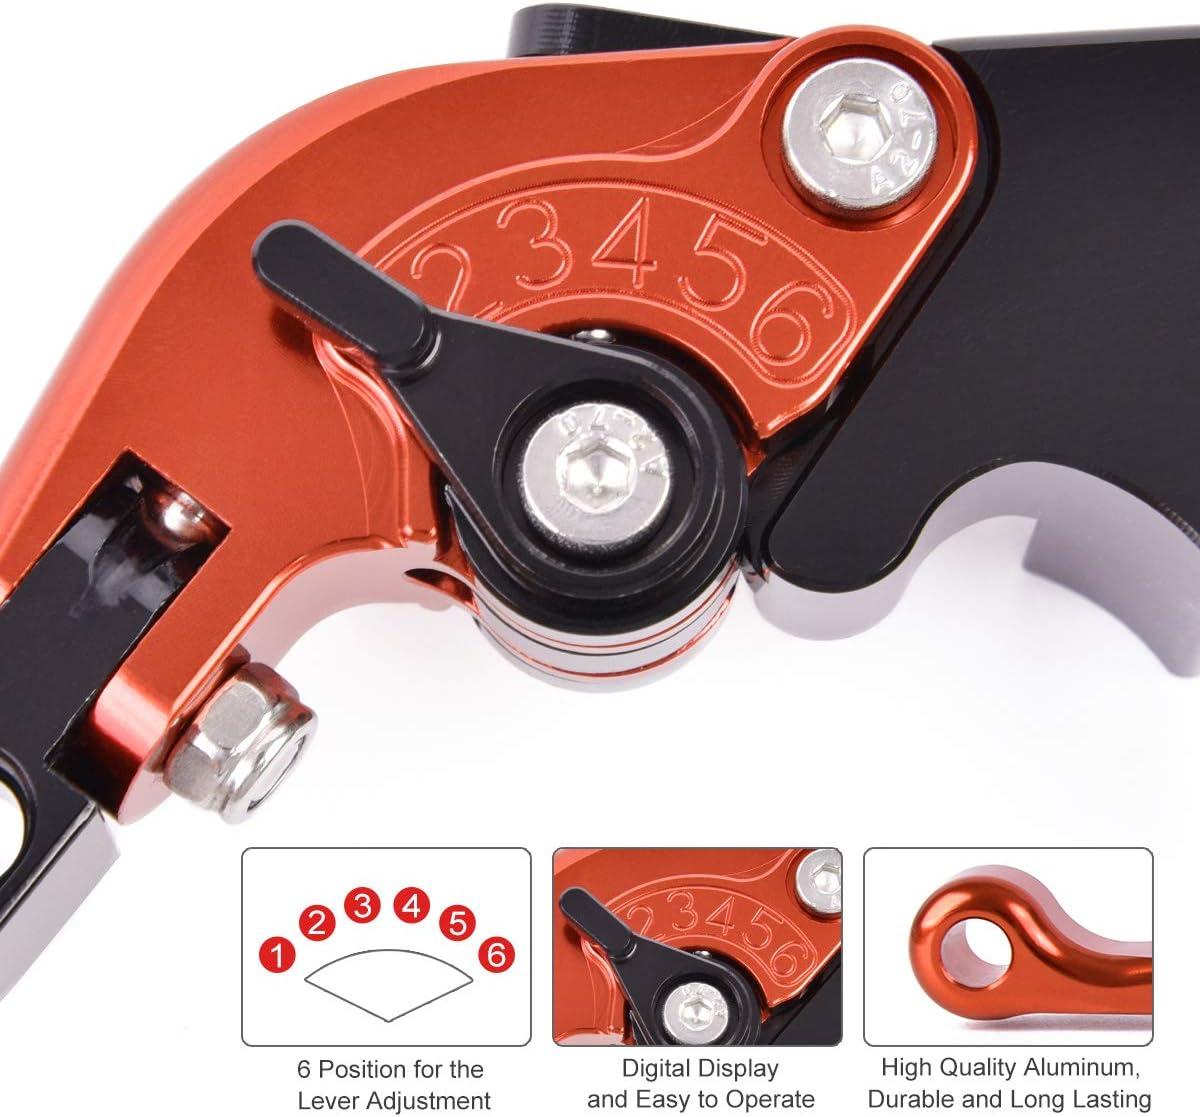 Auzkong vouwbare verstelbare CNC remkoppelingshenders voor Aprilia RS 250 1995-2002, Pegaso 650 1992-2004 Green-Silver-Red-2 Orange-Black-Orange